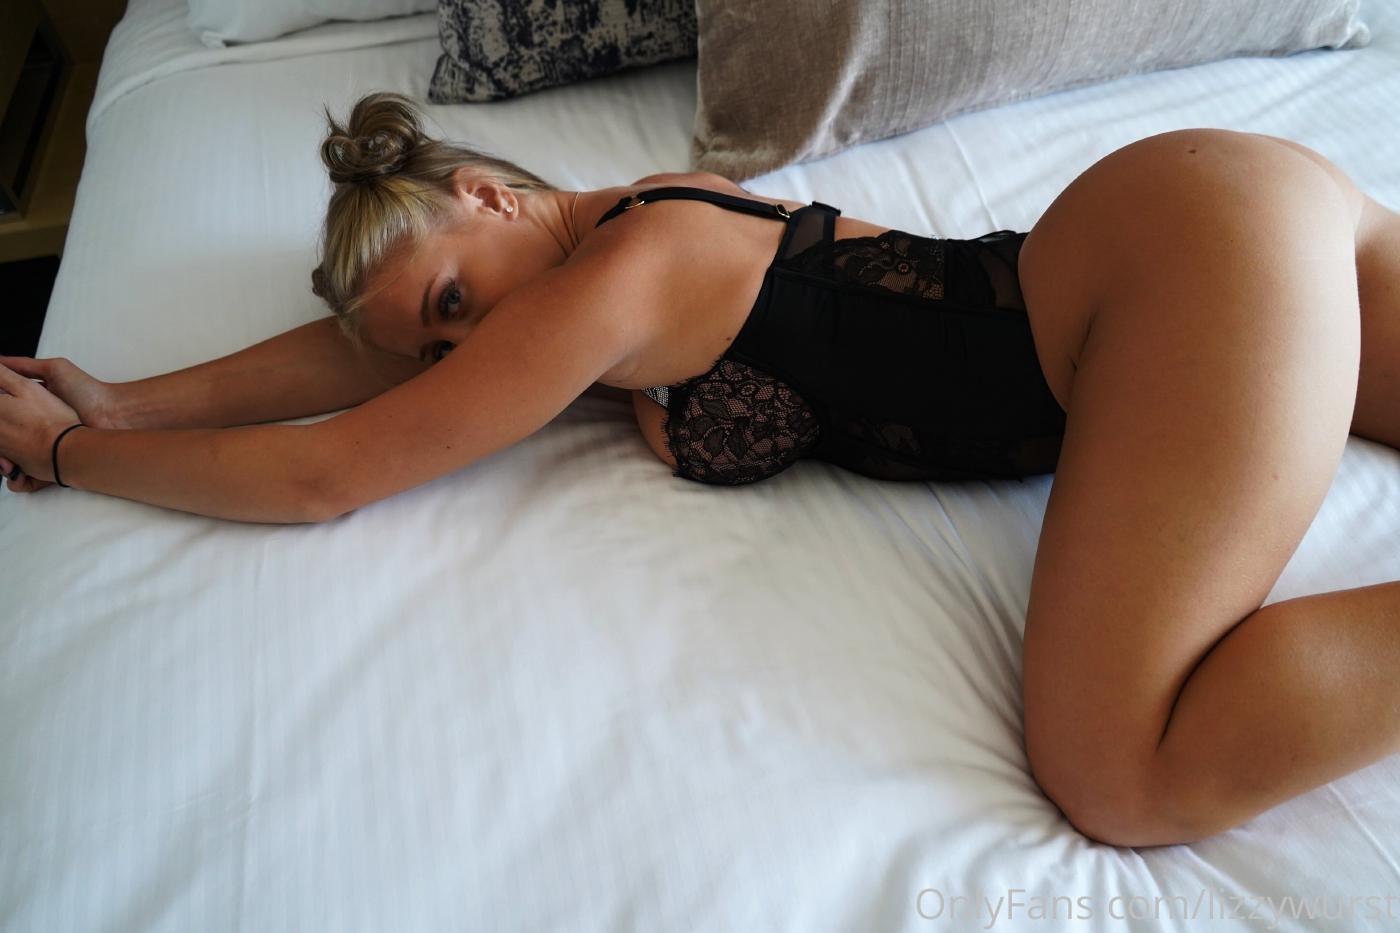 Lizzy Wurst Lingerie Onlyfans Set Leaked 0004